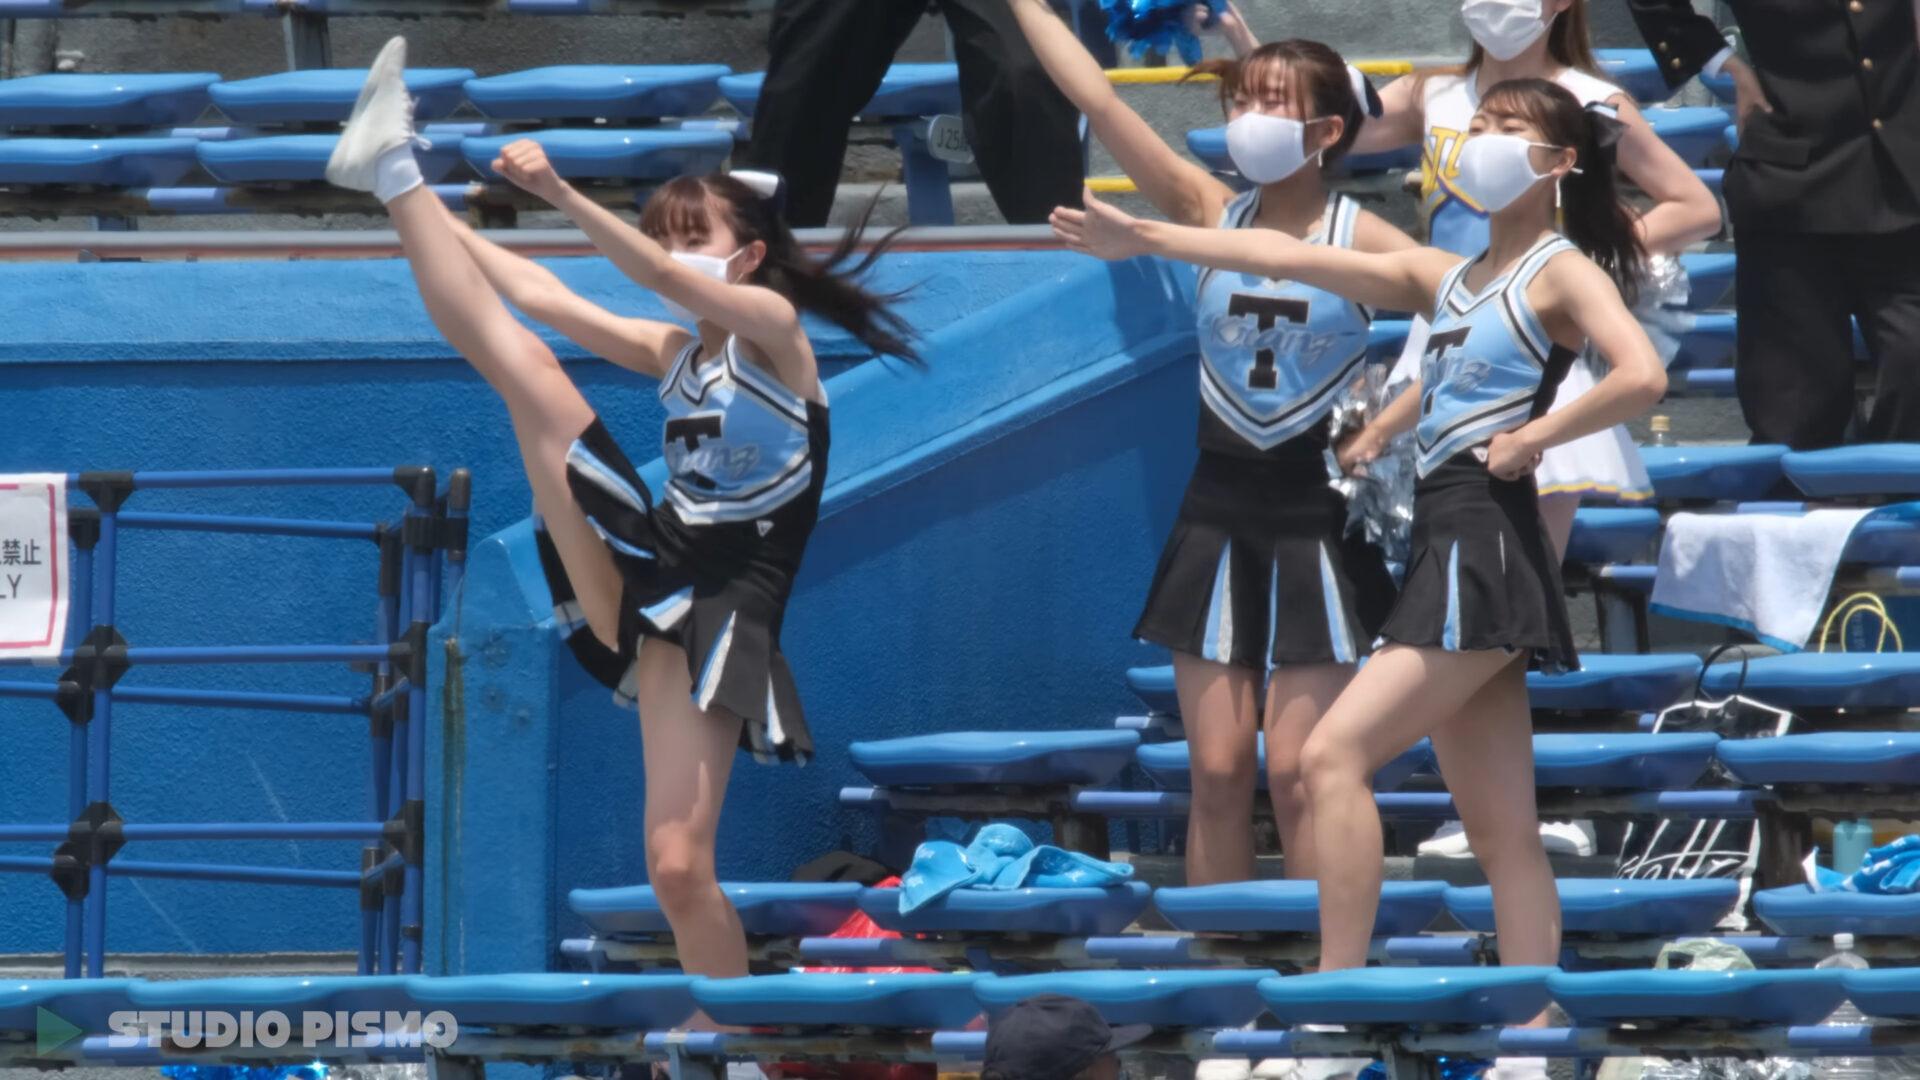 UHD 2021春季リーグ戦 第7週2回戦【東京大学 8回裏】闘魂は〜 04:48